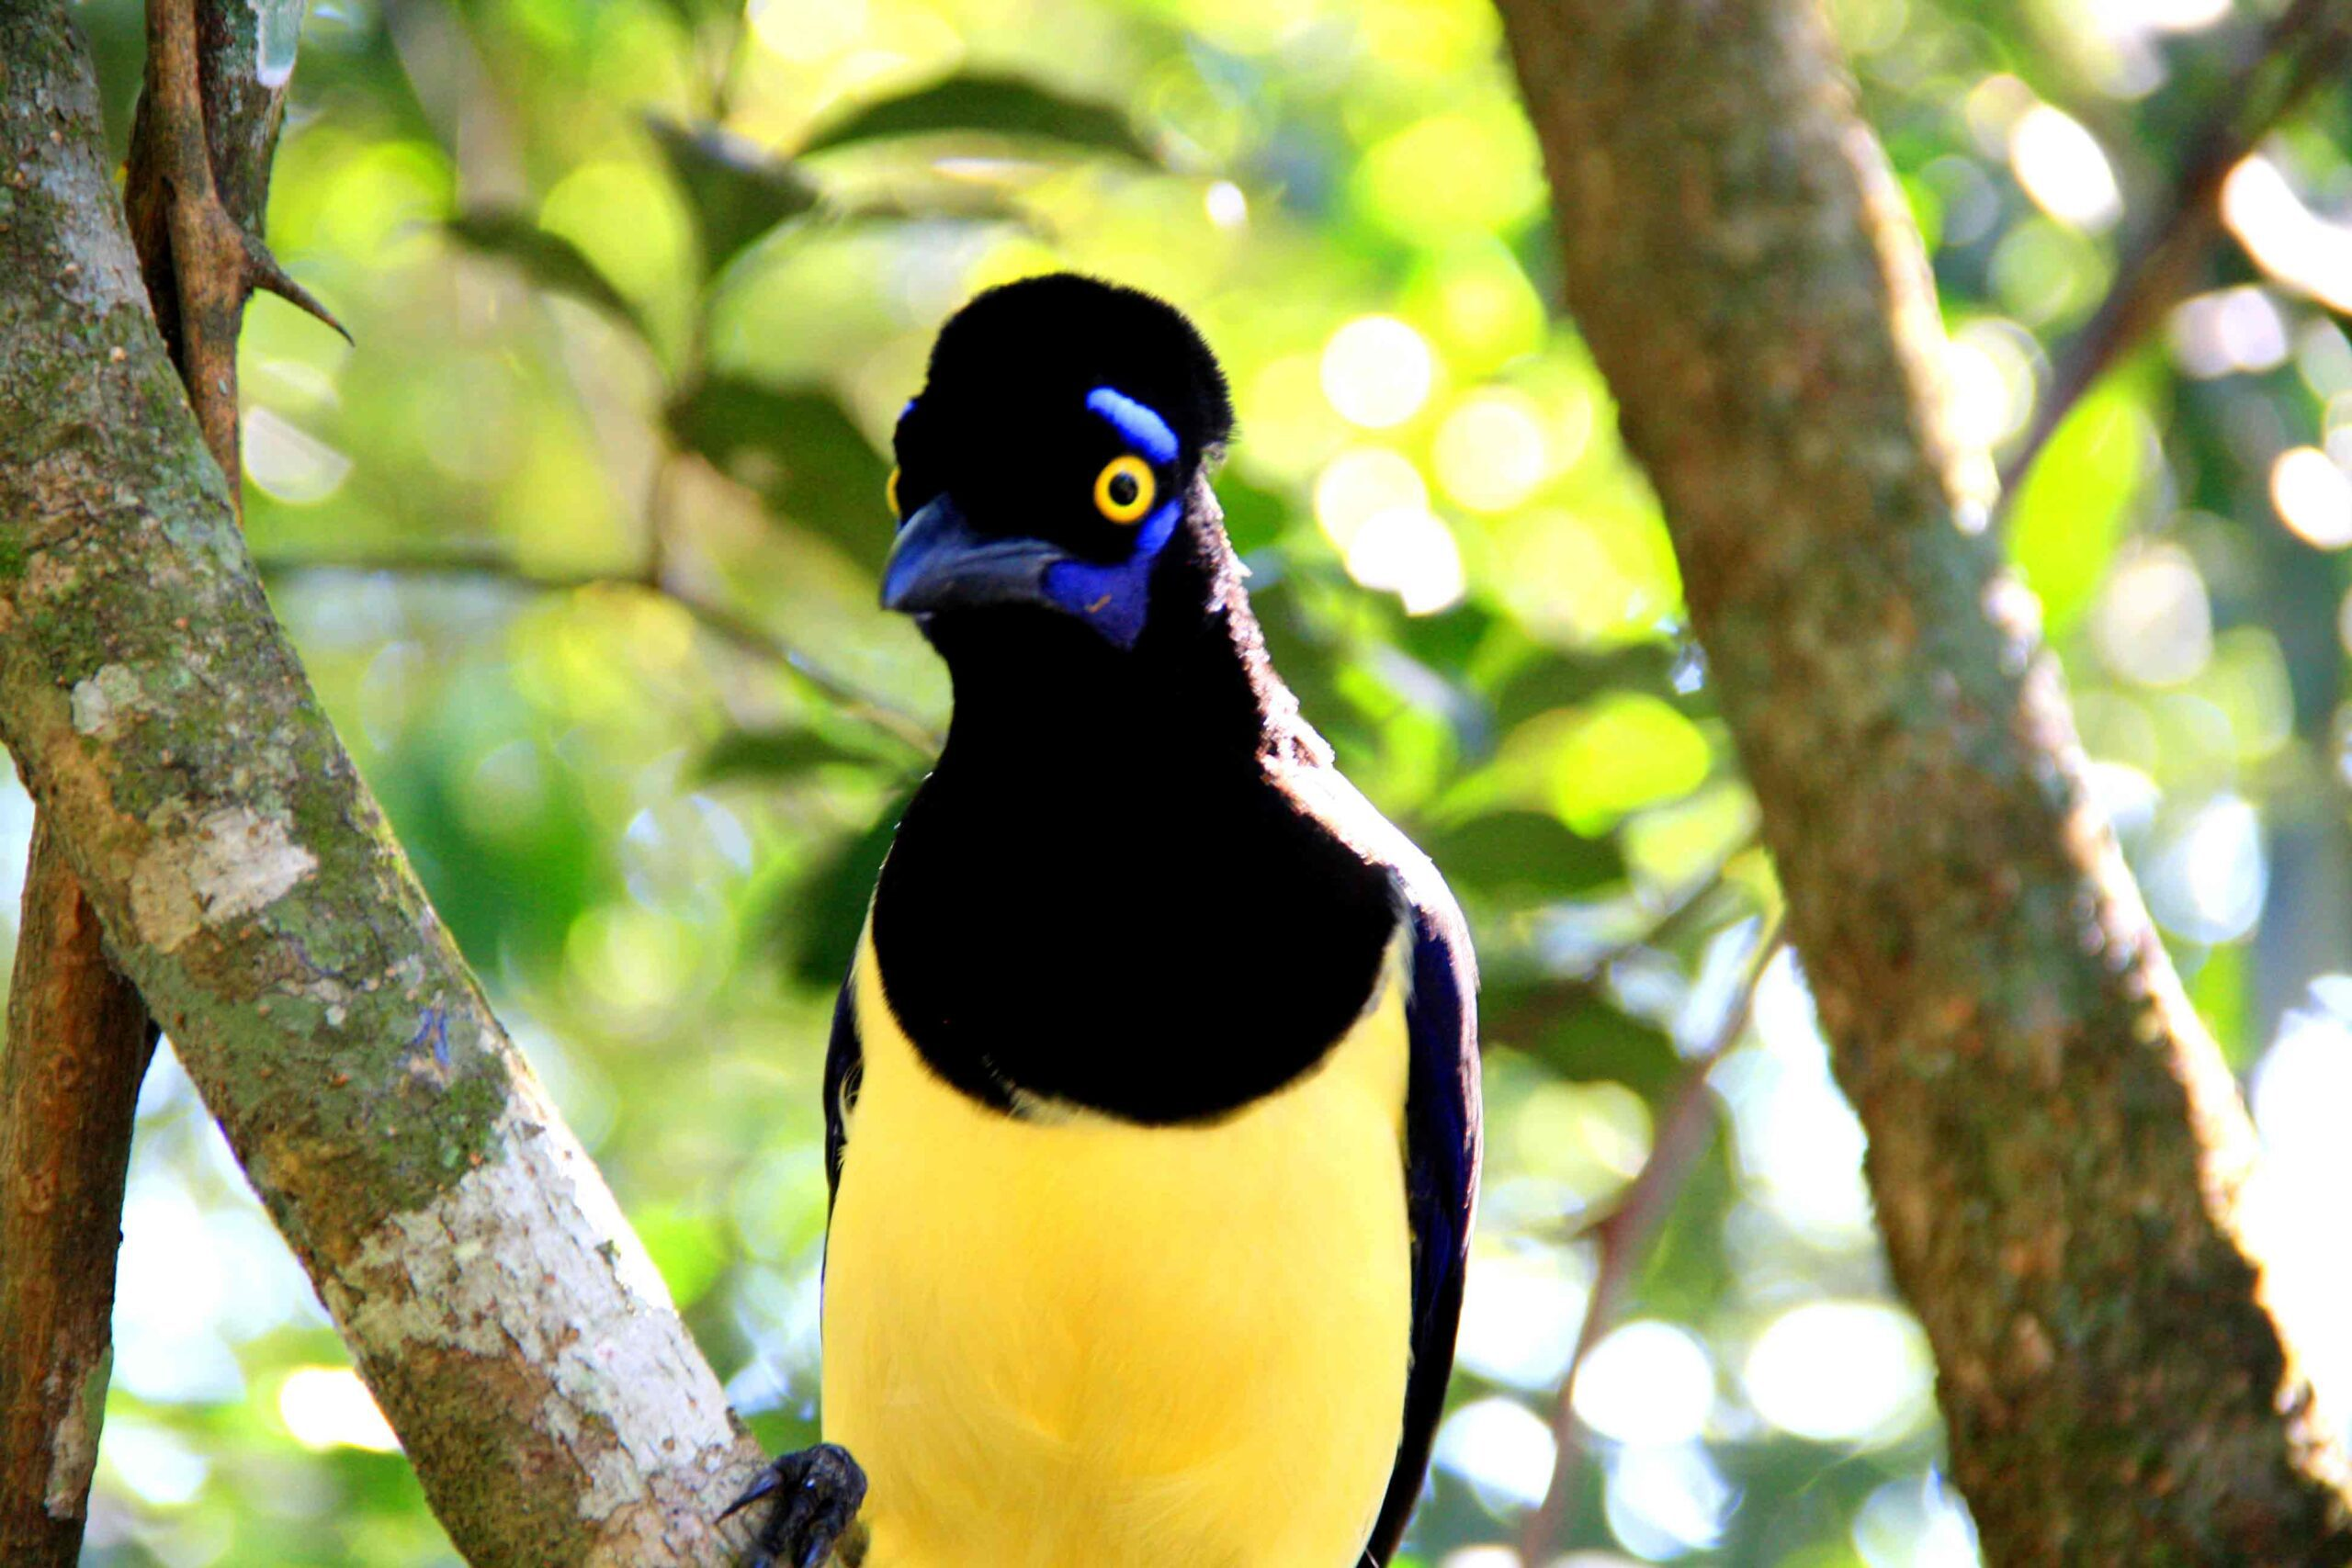 Colorful bird at Iguazu Falls in Argentina